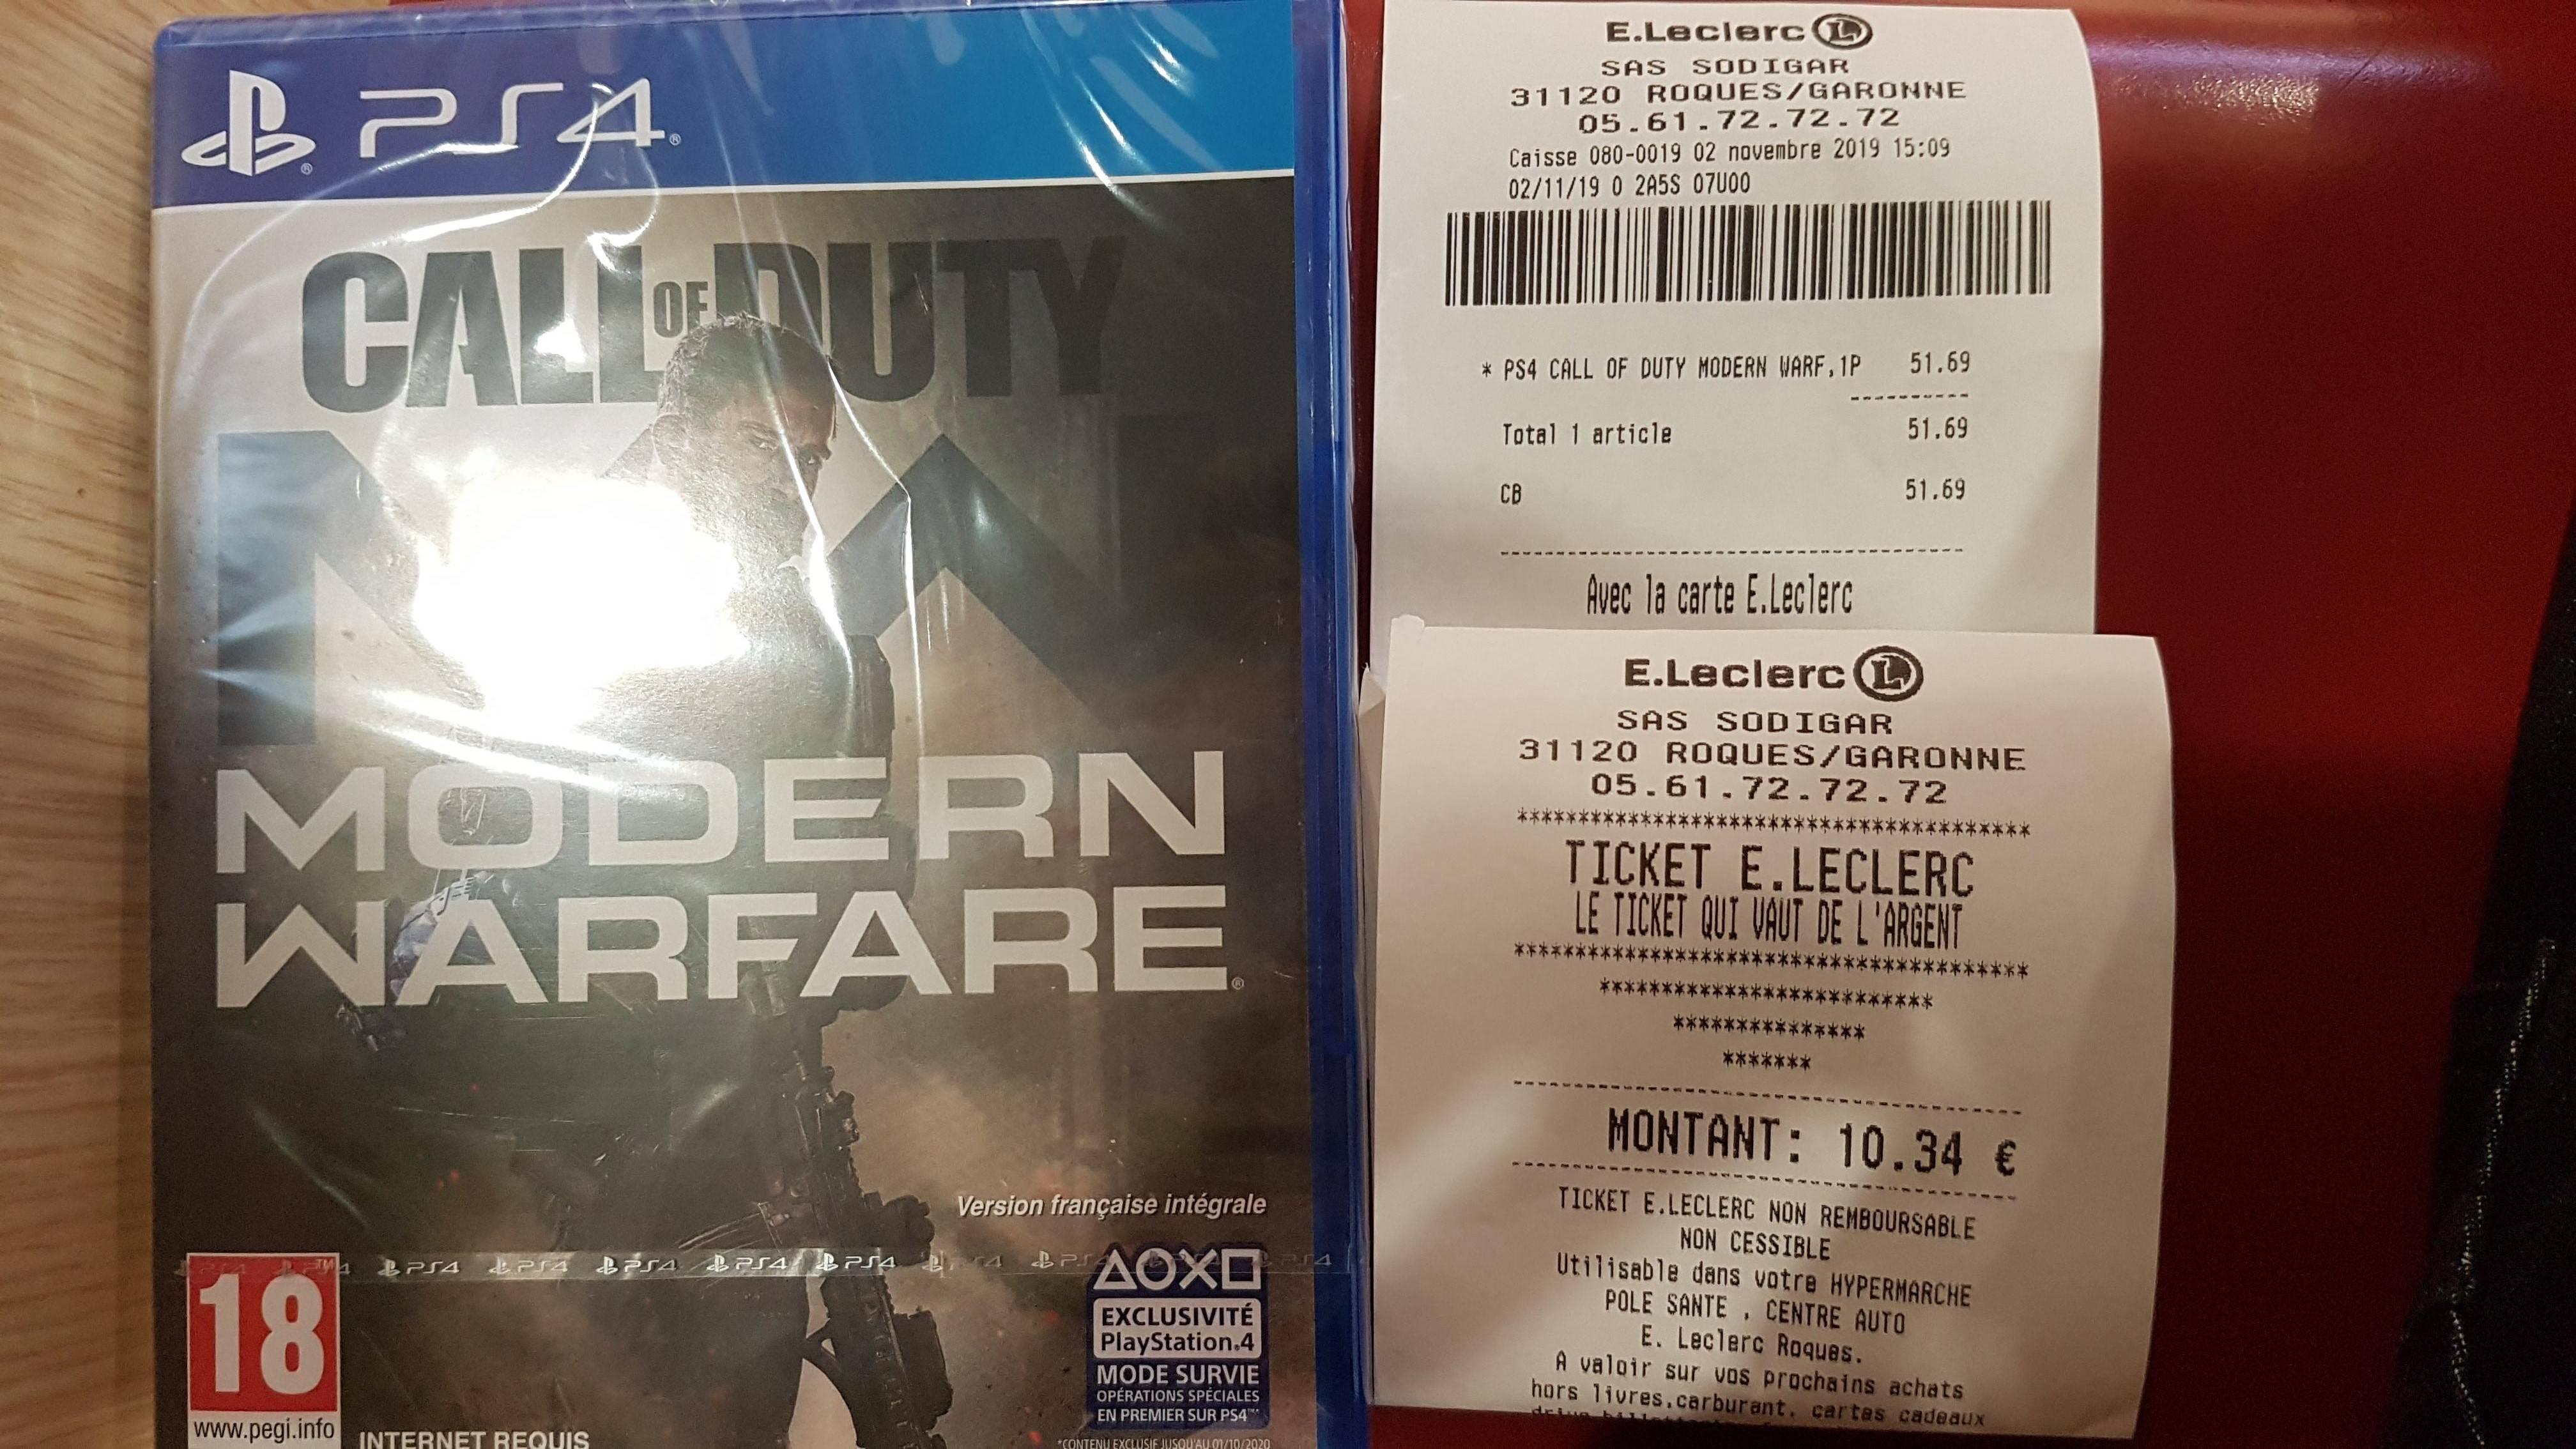 Toulouse (31) Call of Duty: Modern Warfare sur PS4, Xbox One à 41.35€ (Via 10.34€ en Bon d'achat)